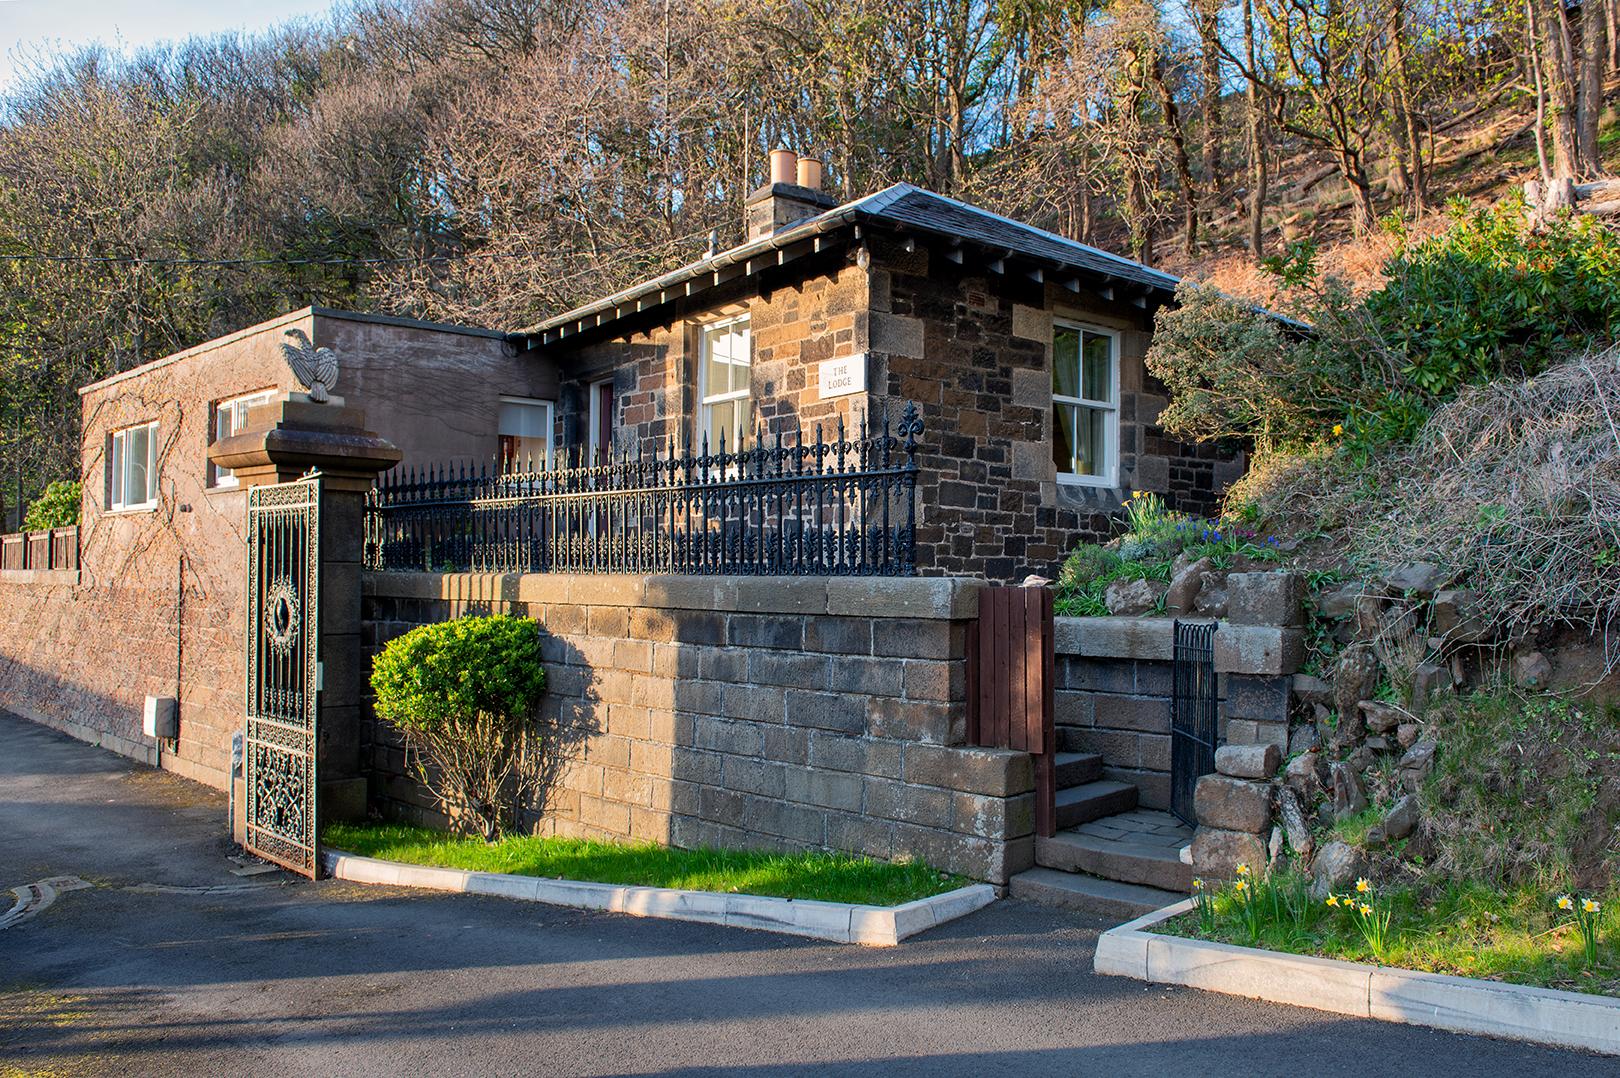 Lodge at The Lodge, Crossgates, Dunfermline